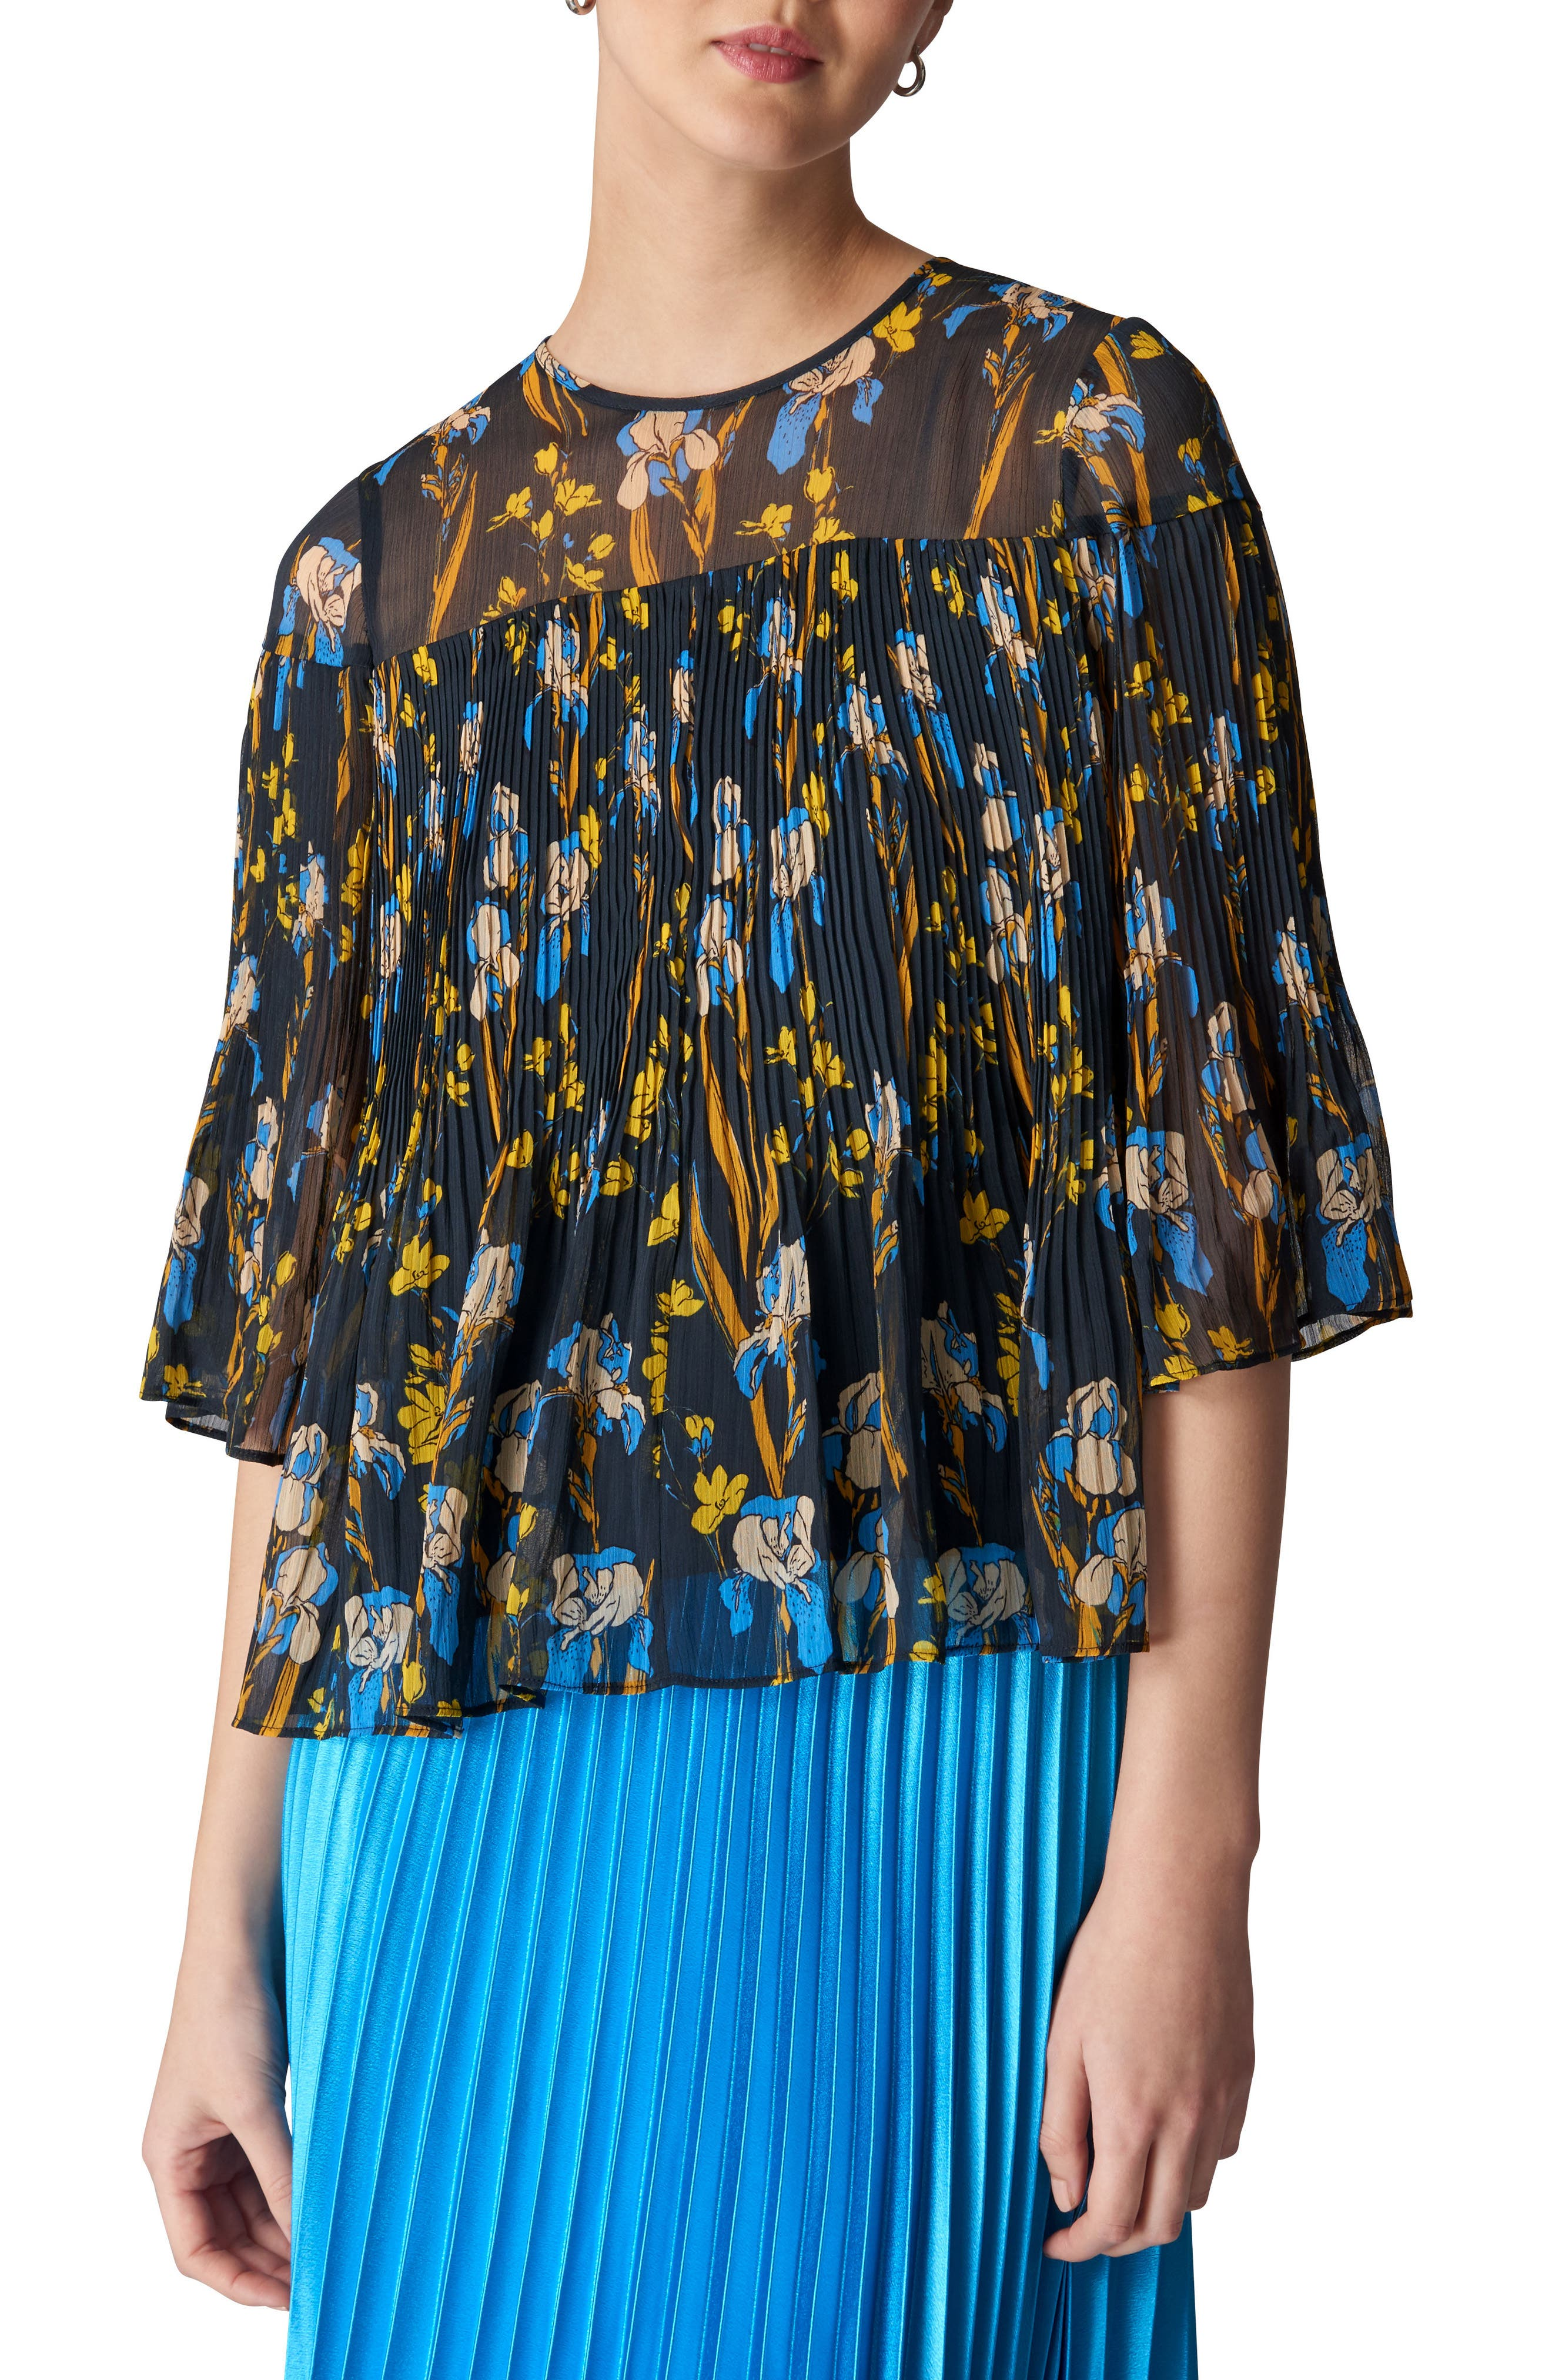 Habiba Iris Pleat Top,                         Main,                         color, Navy/ Multi